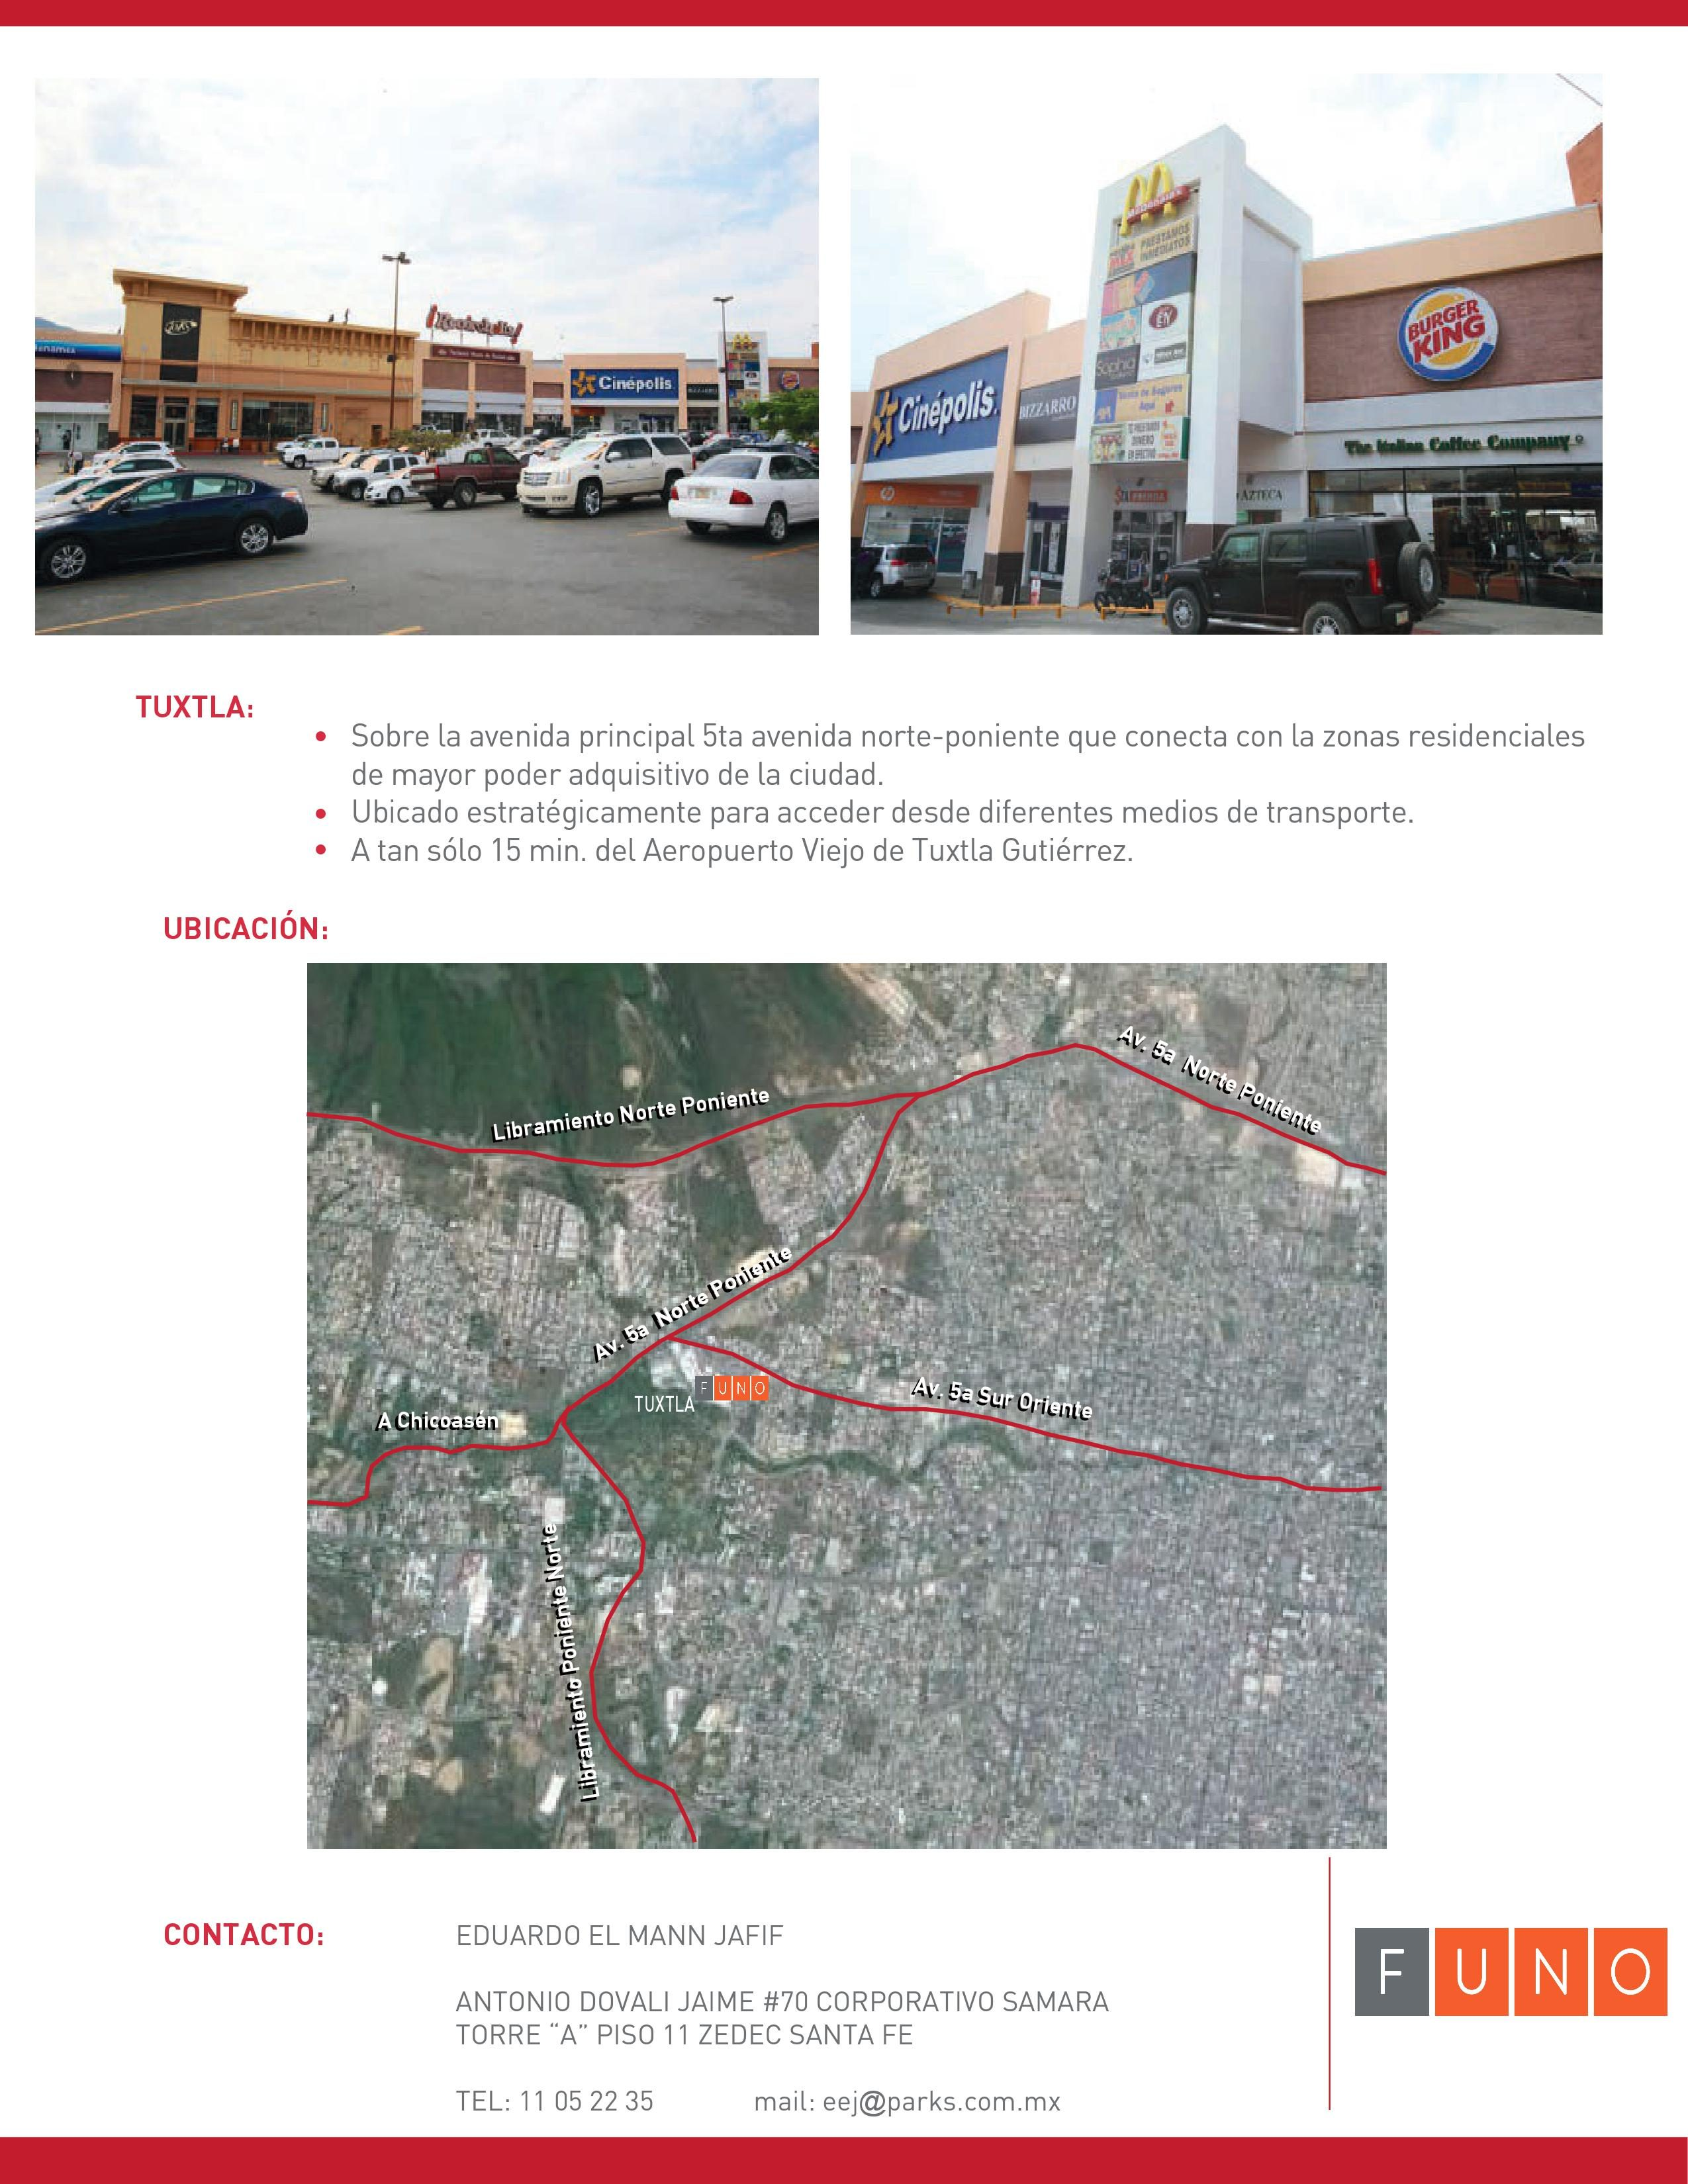 Co-Brochure Las Américas Tuxtla (2)